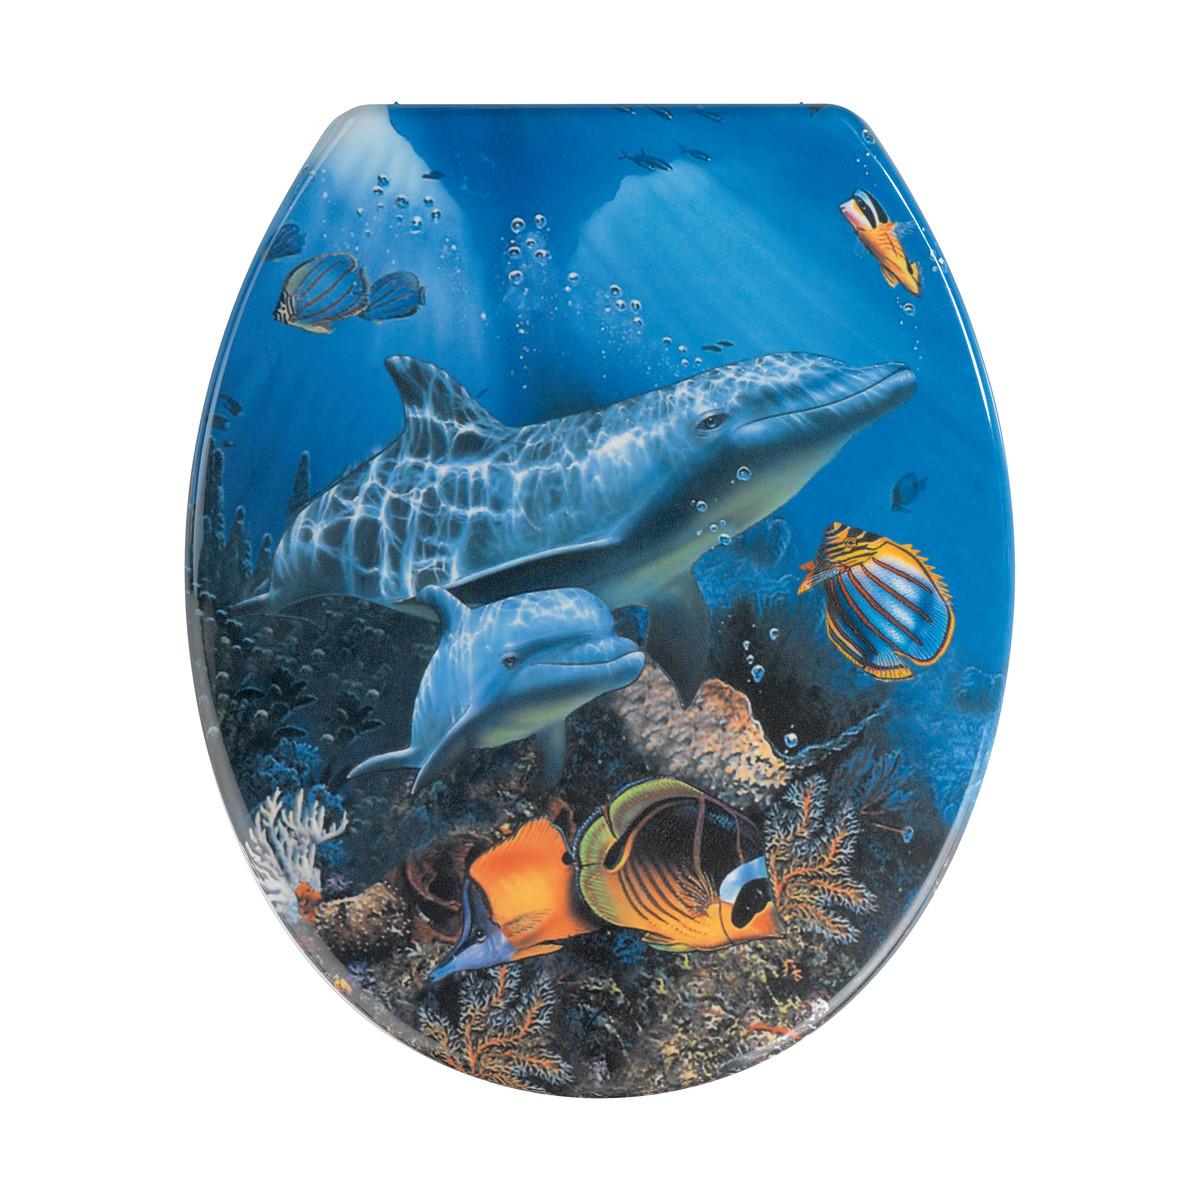 Kerasan copriwater flo kerasan prezzo e offerte sottocosto for Copriwater leroy merlin